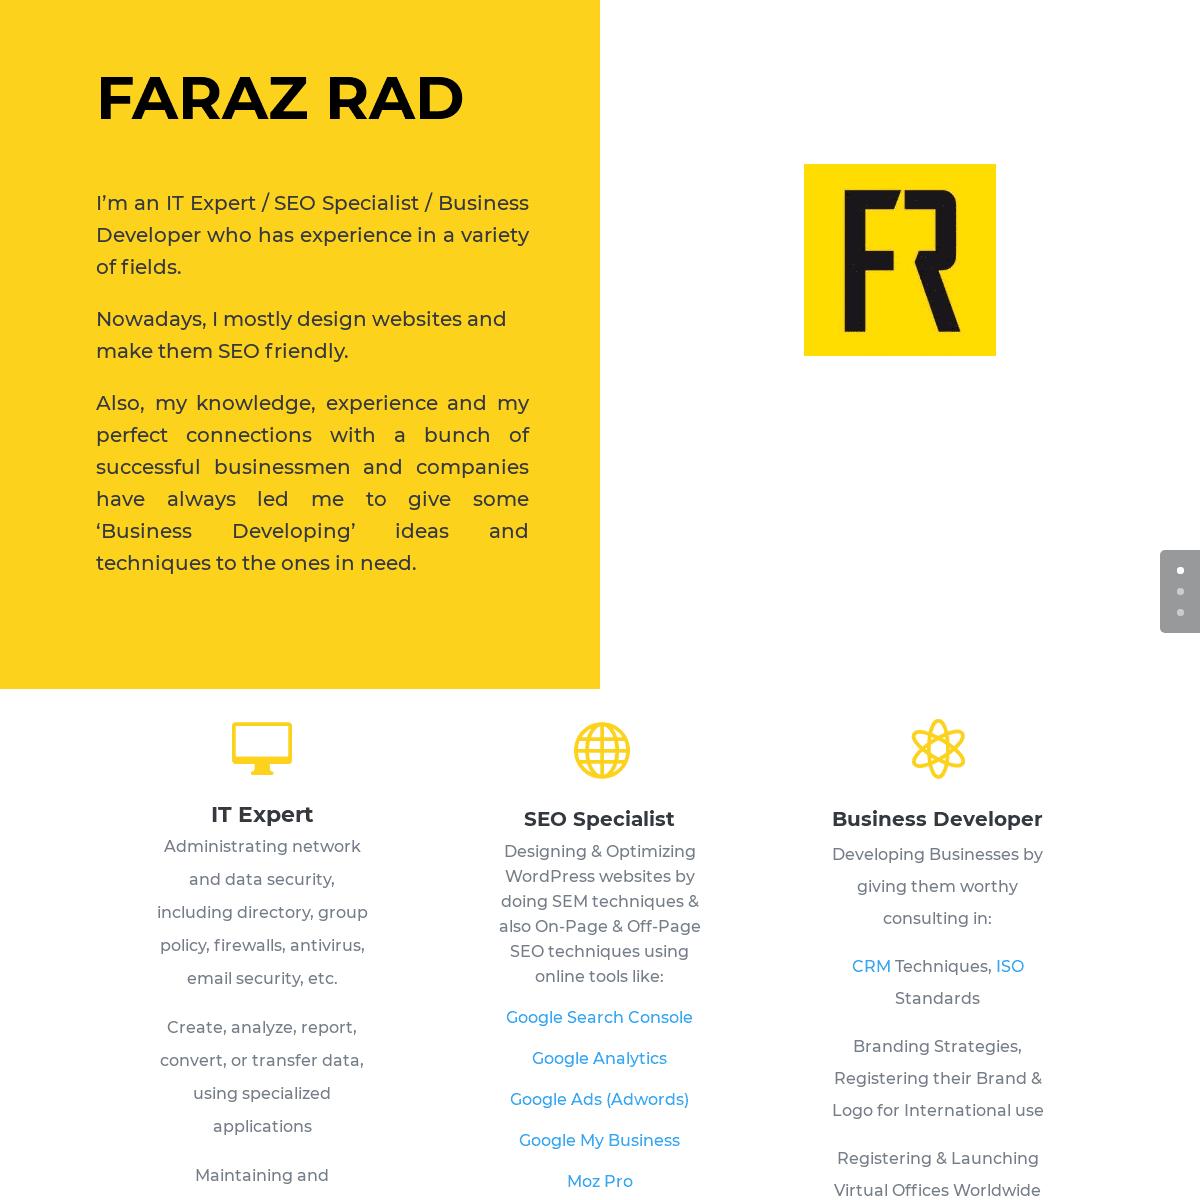 ArchiveBay.com - farazrad.info - Faraz Rad - IT Expert - SEO Specialist - Business Developer